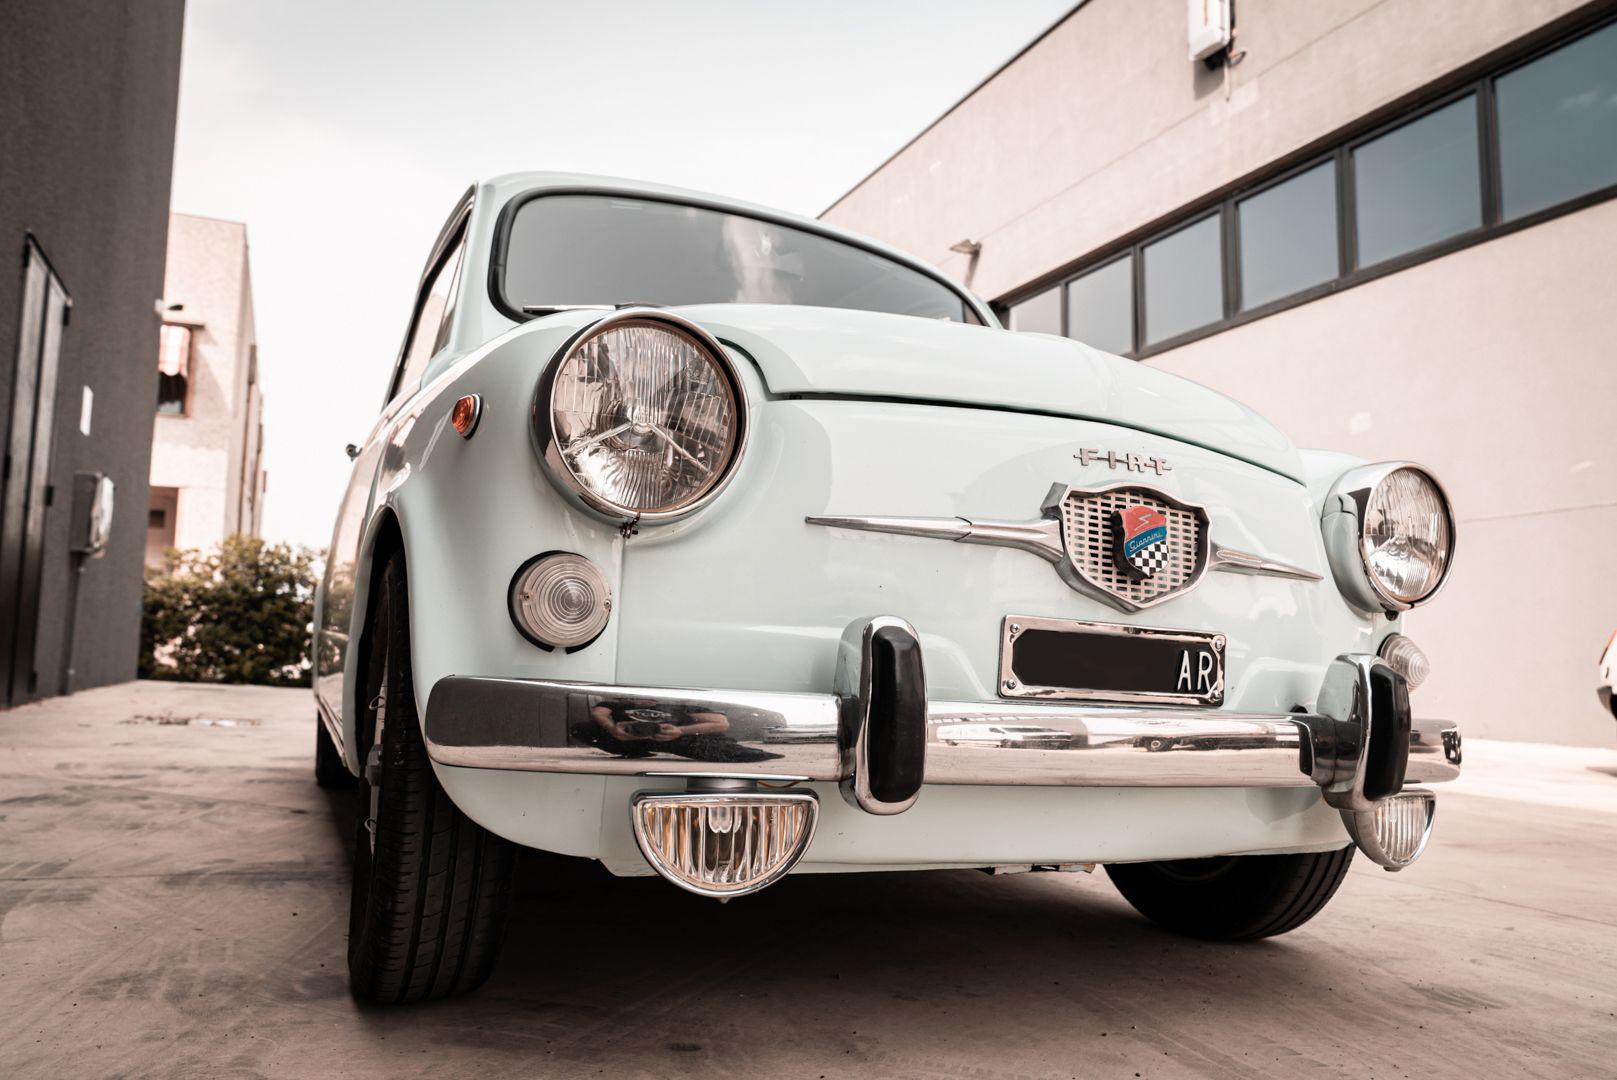 1968 Fiat Giannini 750 TV Turismo Veloce 77086